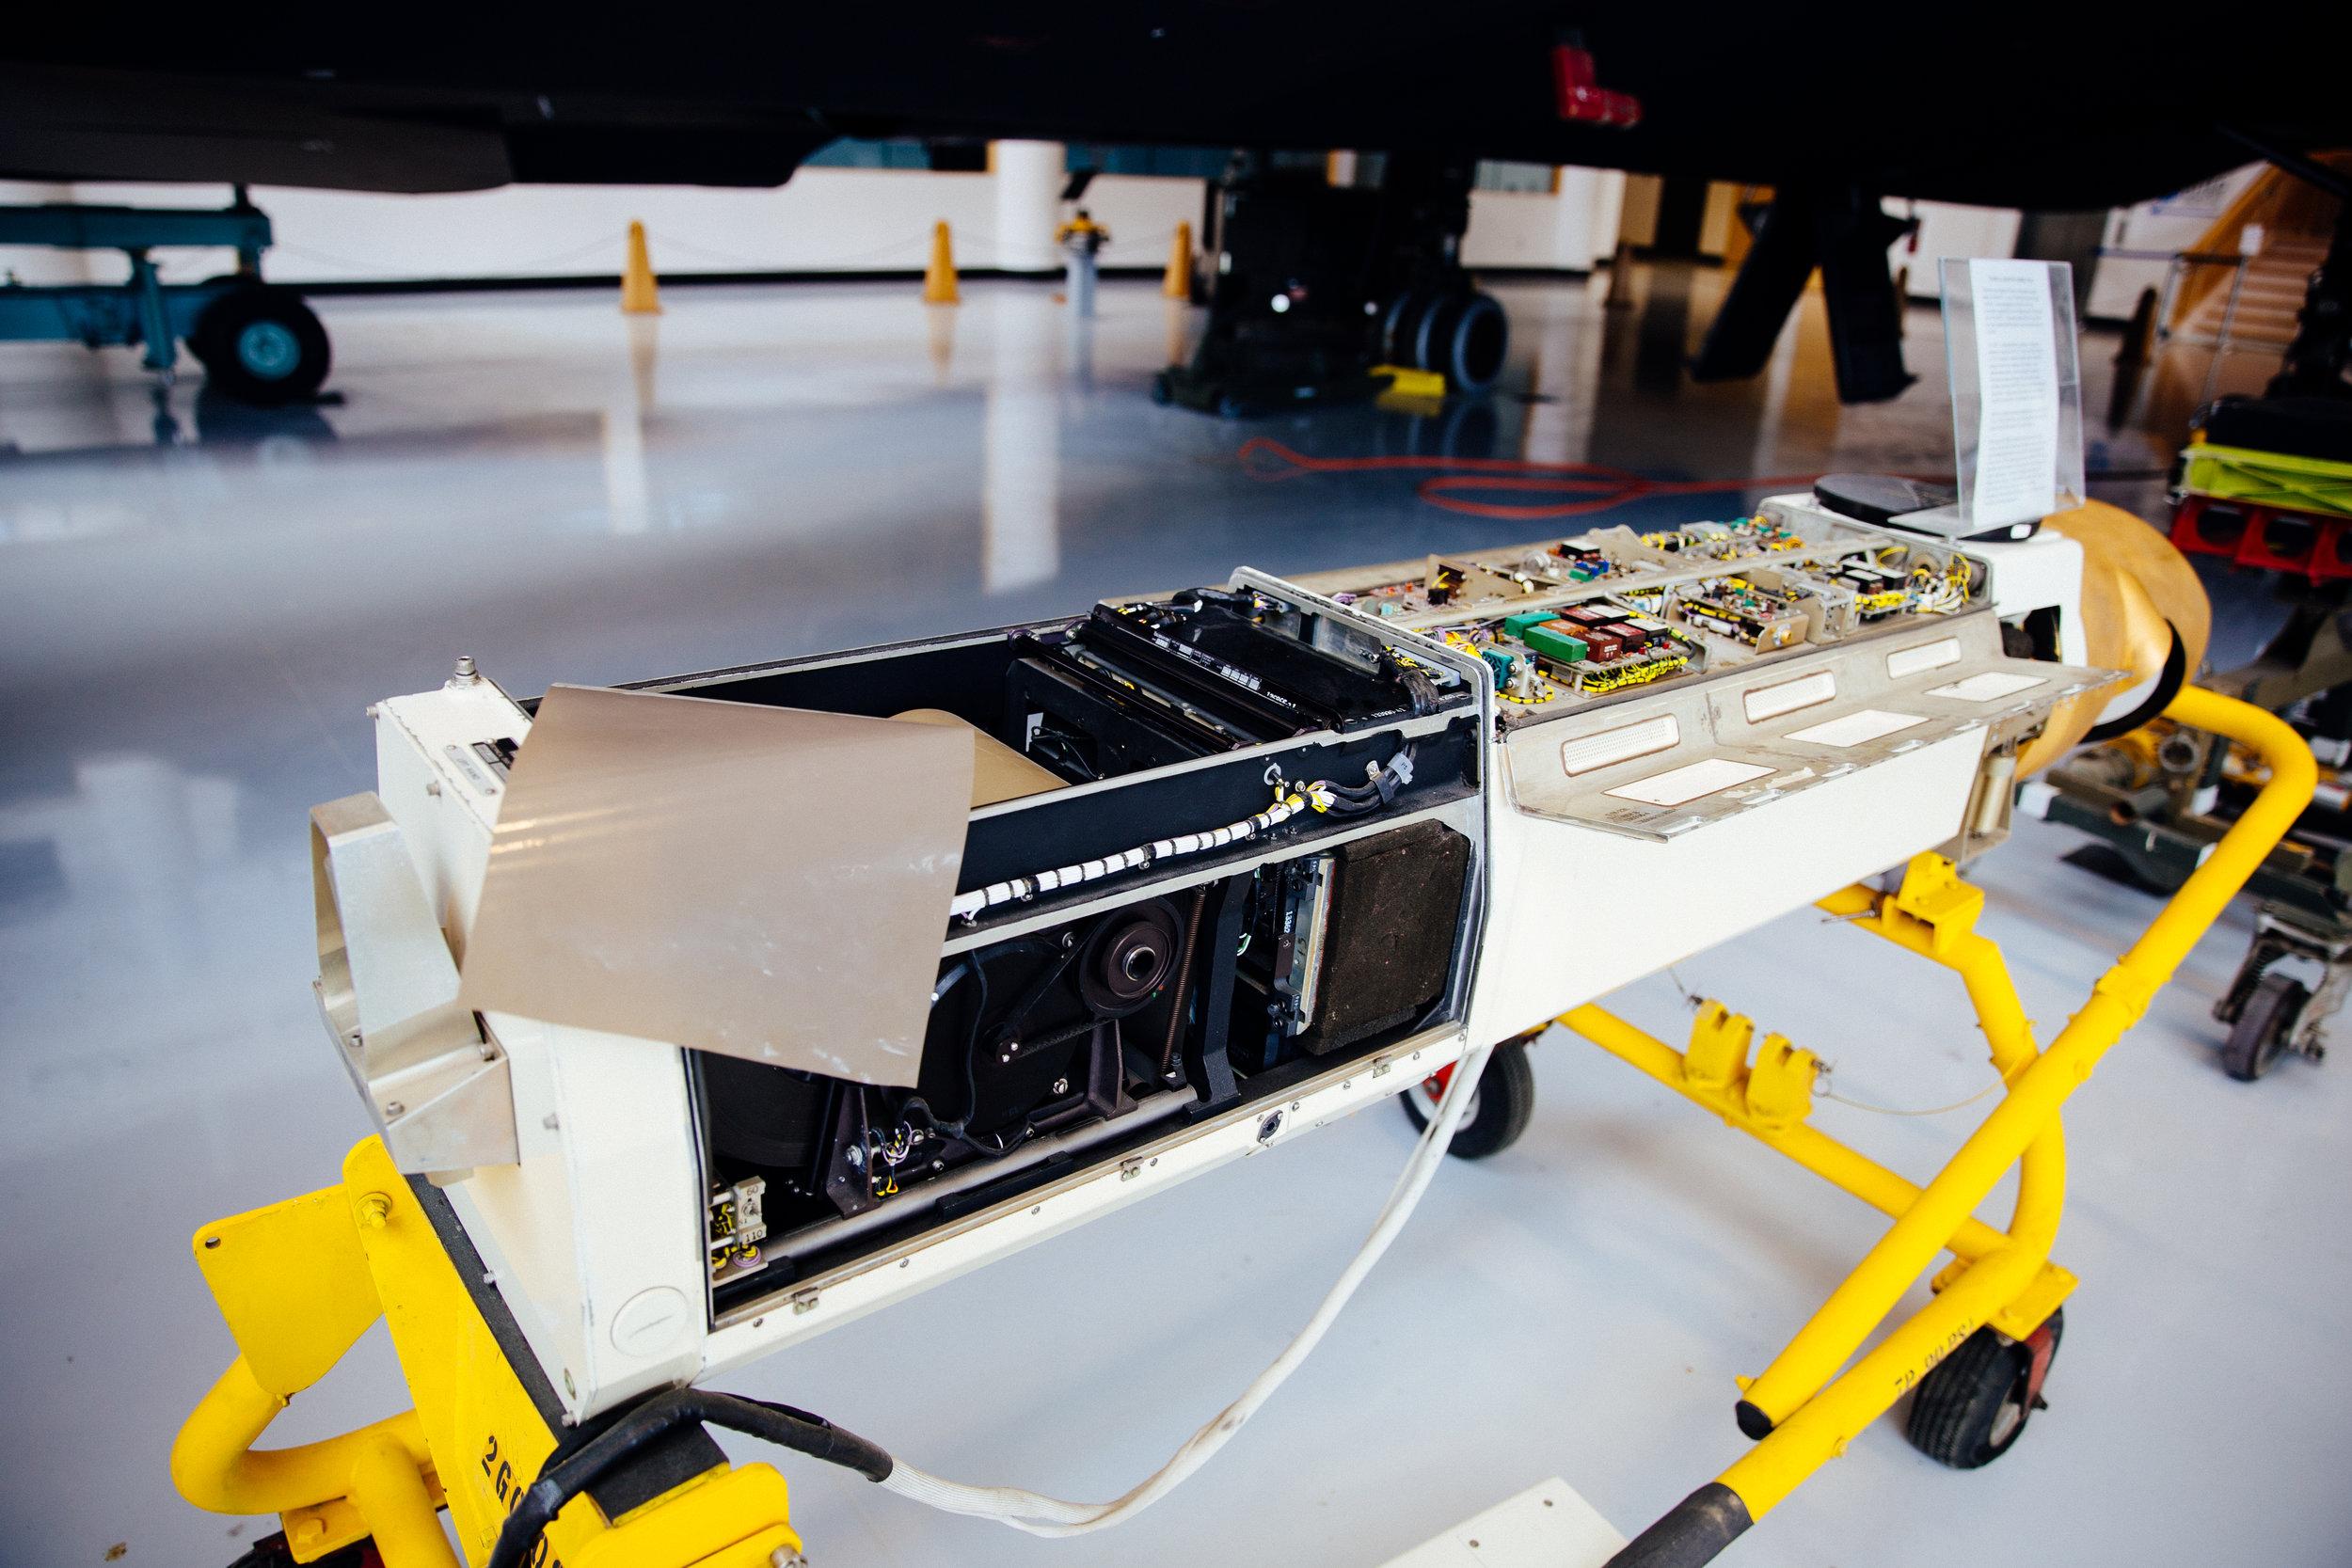 Camera for the SR-71 Blackbird